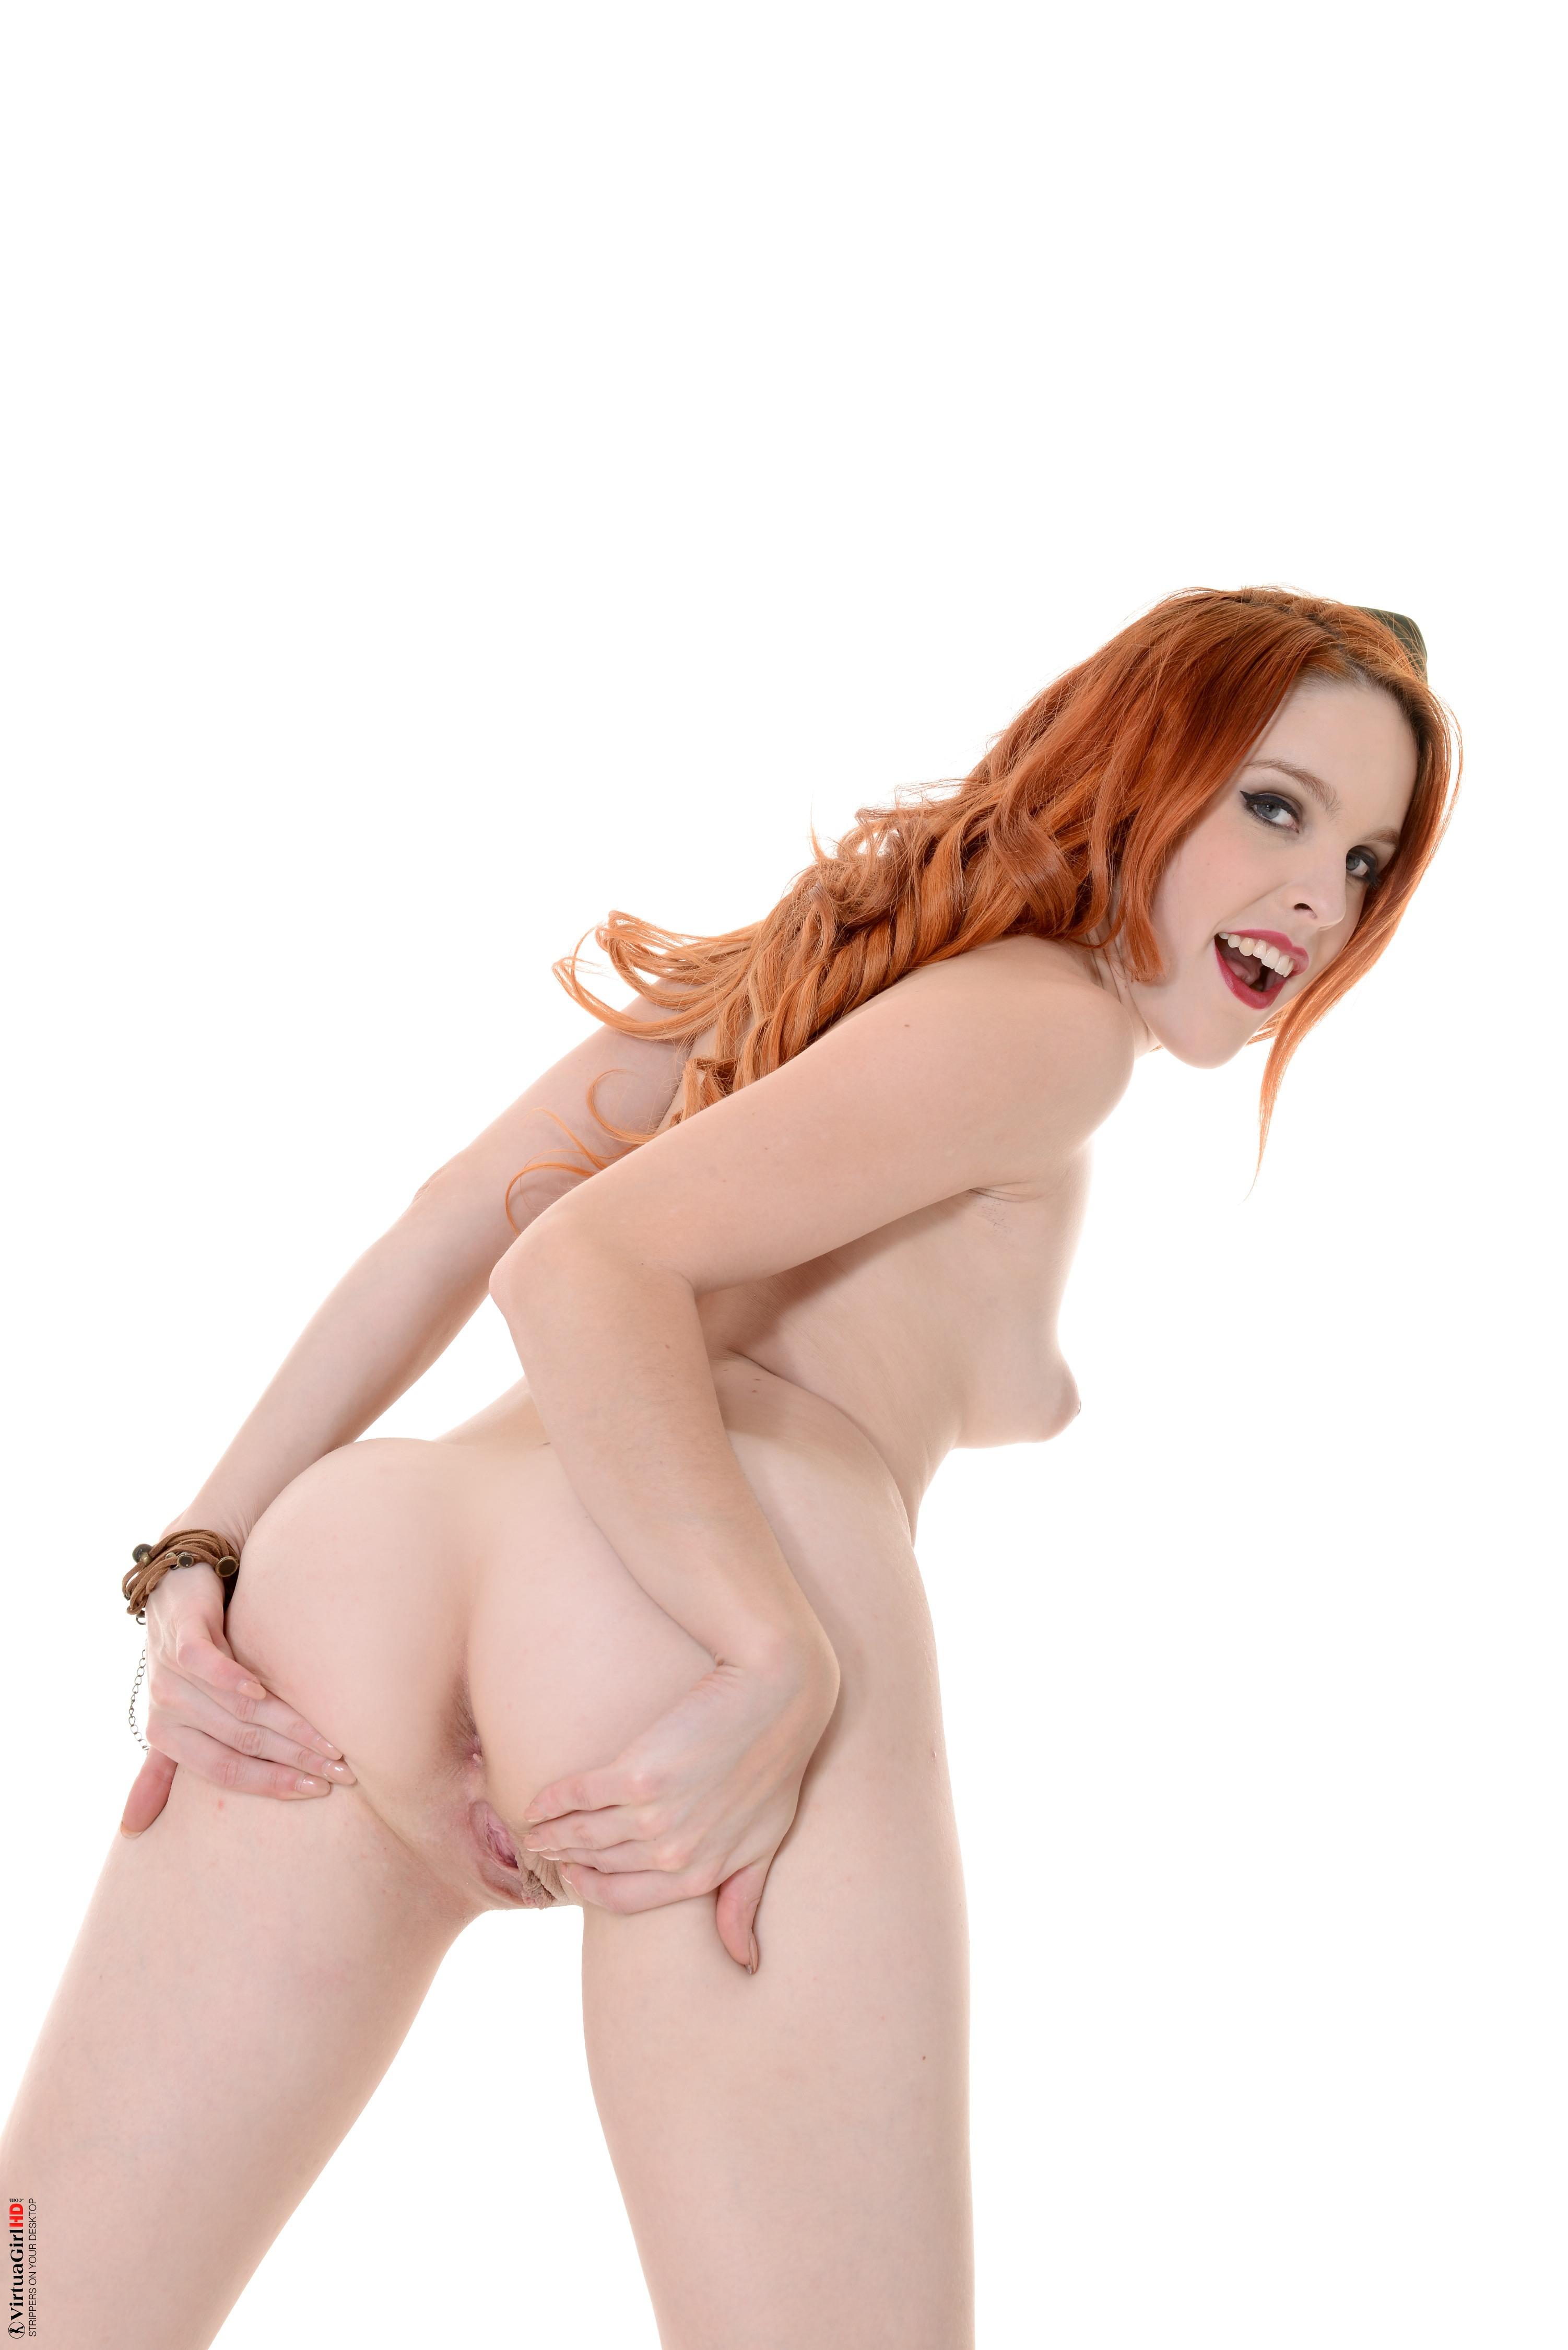 beautiful erotic girl women wallpaper hd